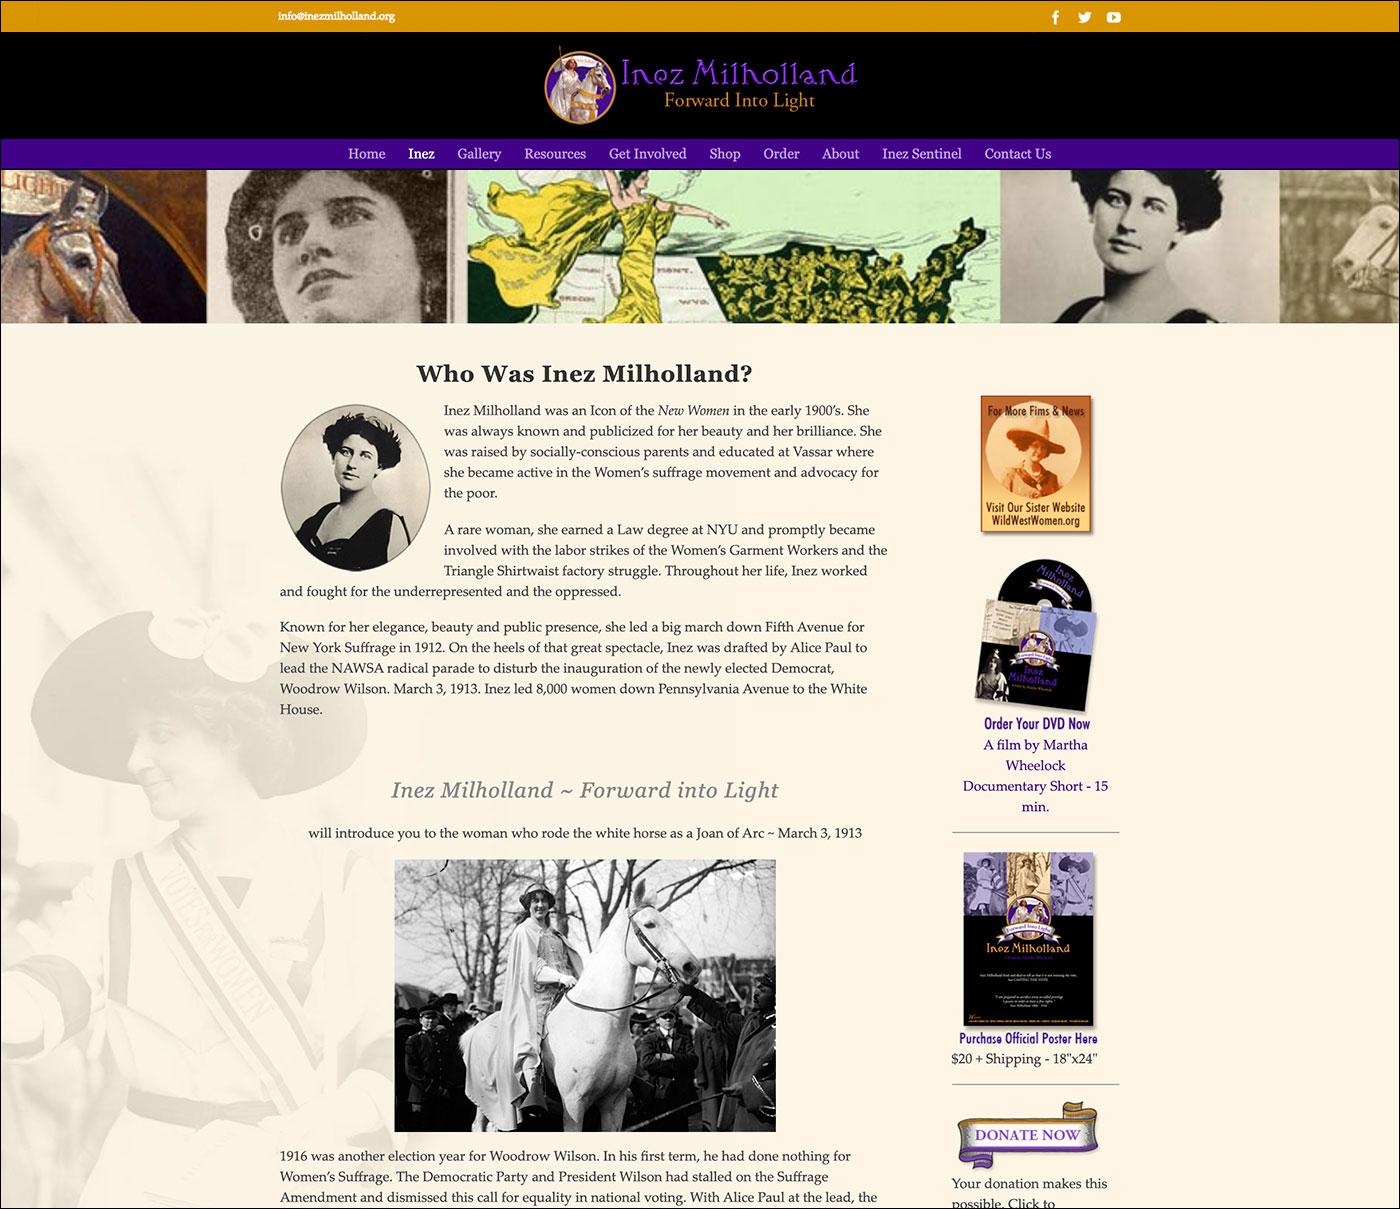 Inez Milholland History